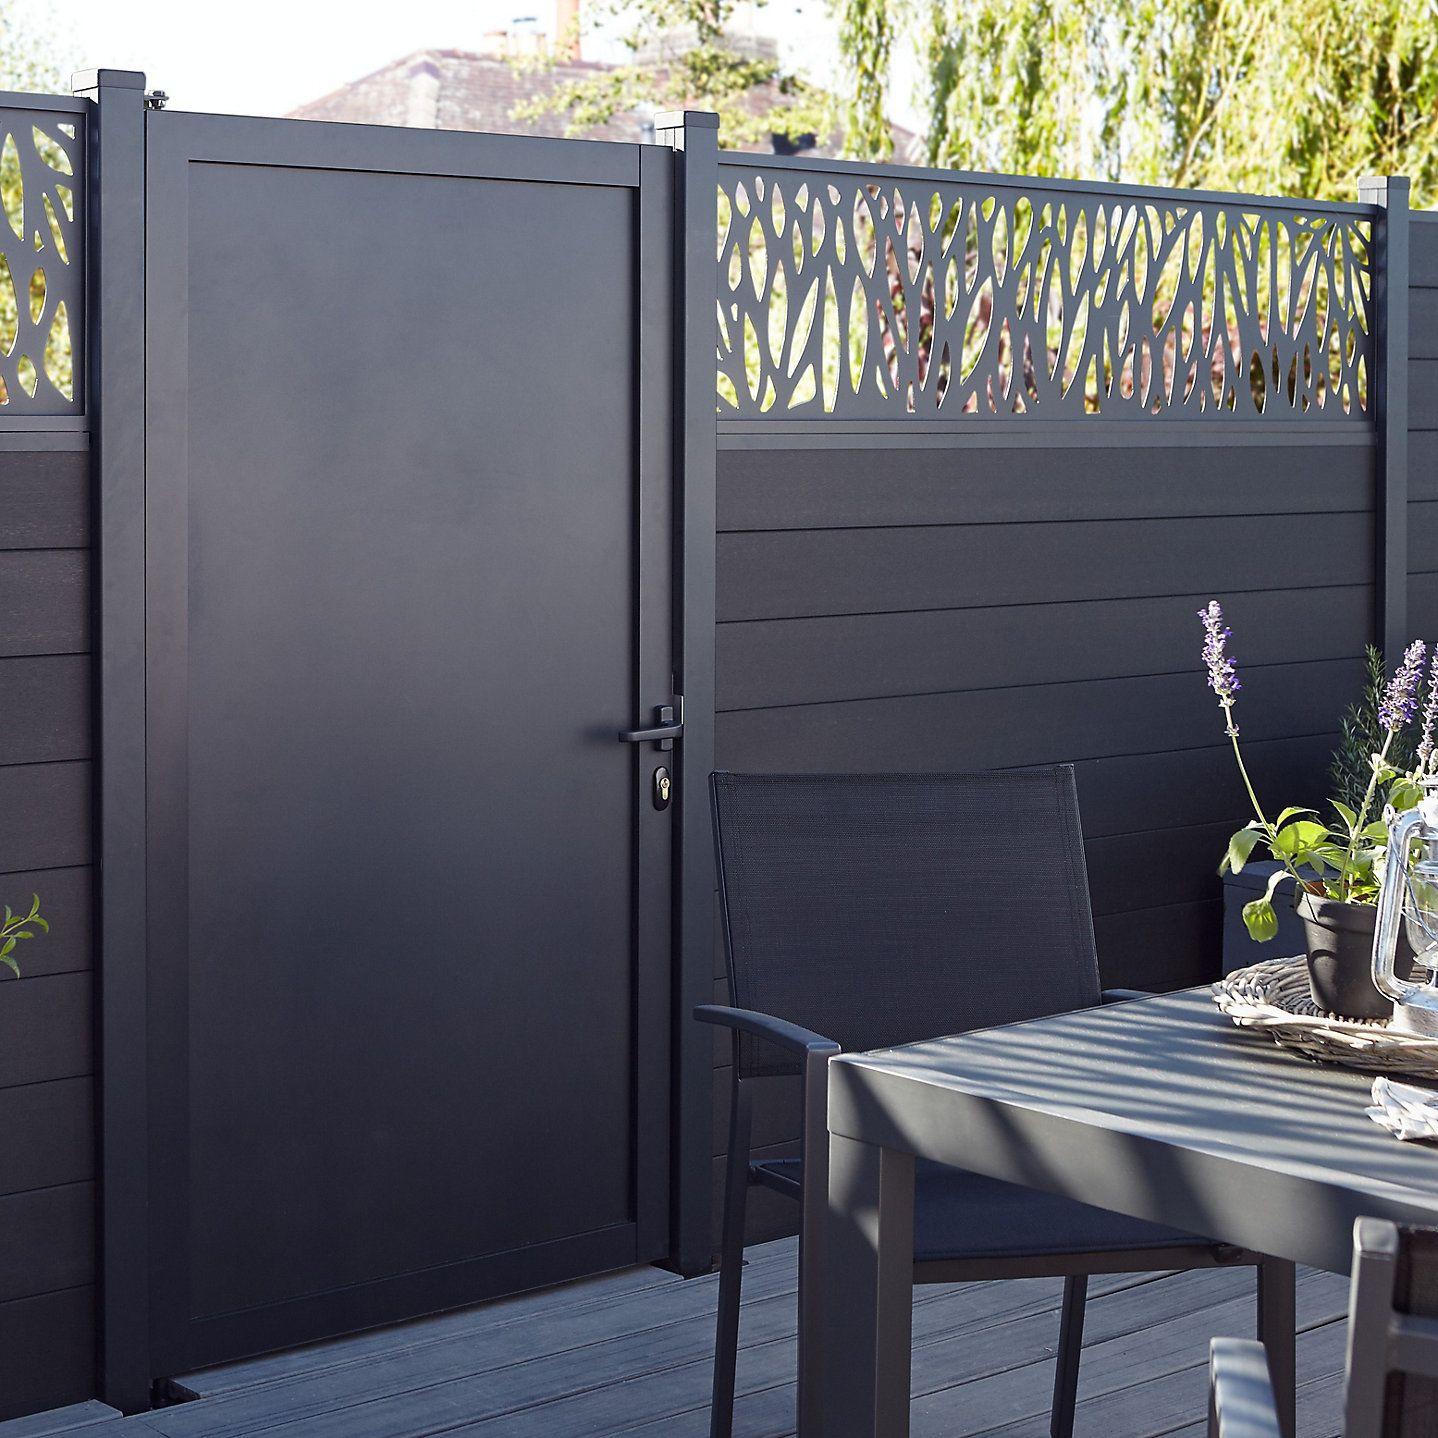 Blooma Neva Gate W 0 93 M H 1 72m Aluminium Gates Back Garden Design Outdoor Gardens Design